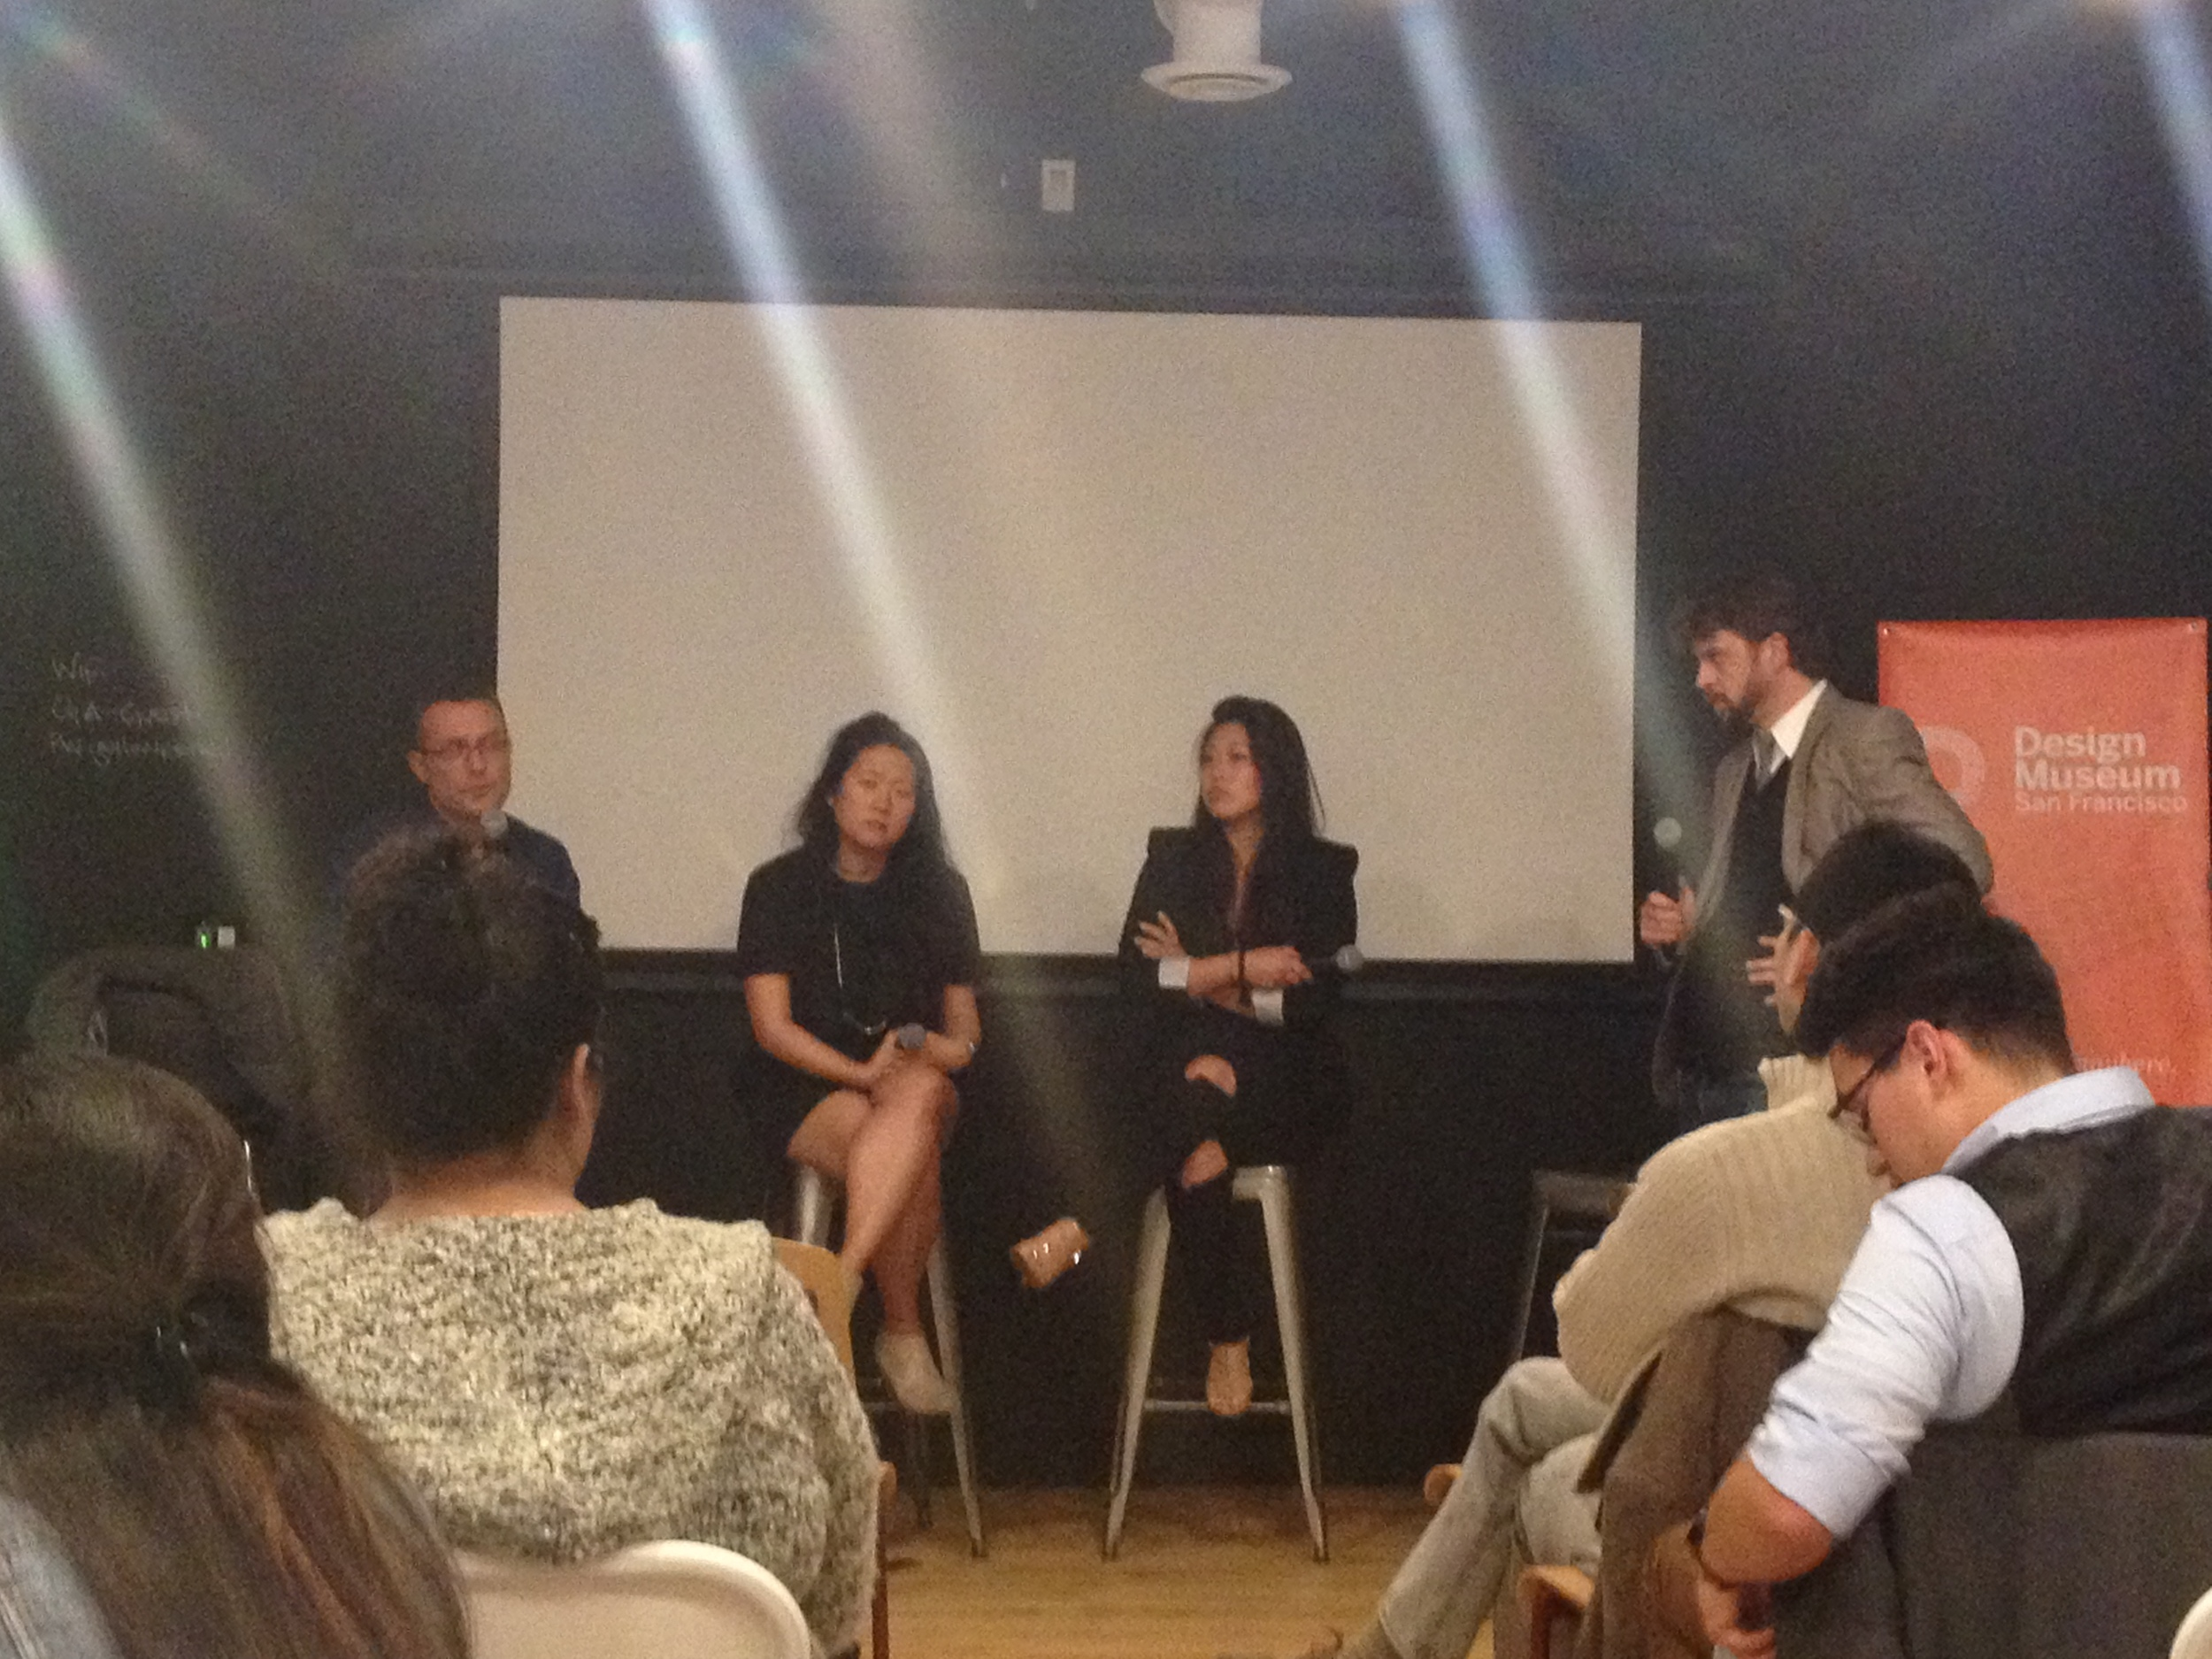 Andrew Dunbar, Mimi O Chun, Angie Kim and Drew Beam | Design X Entrepreneurship Panel, Design Museum San Francisco